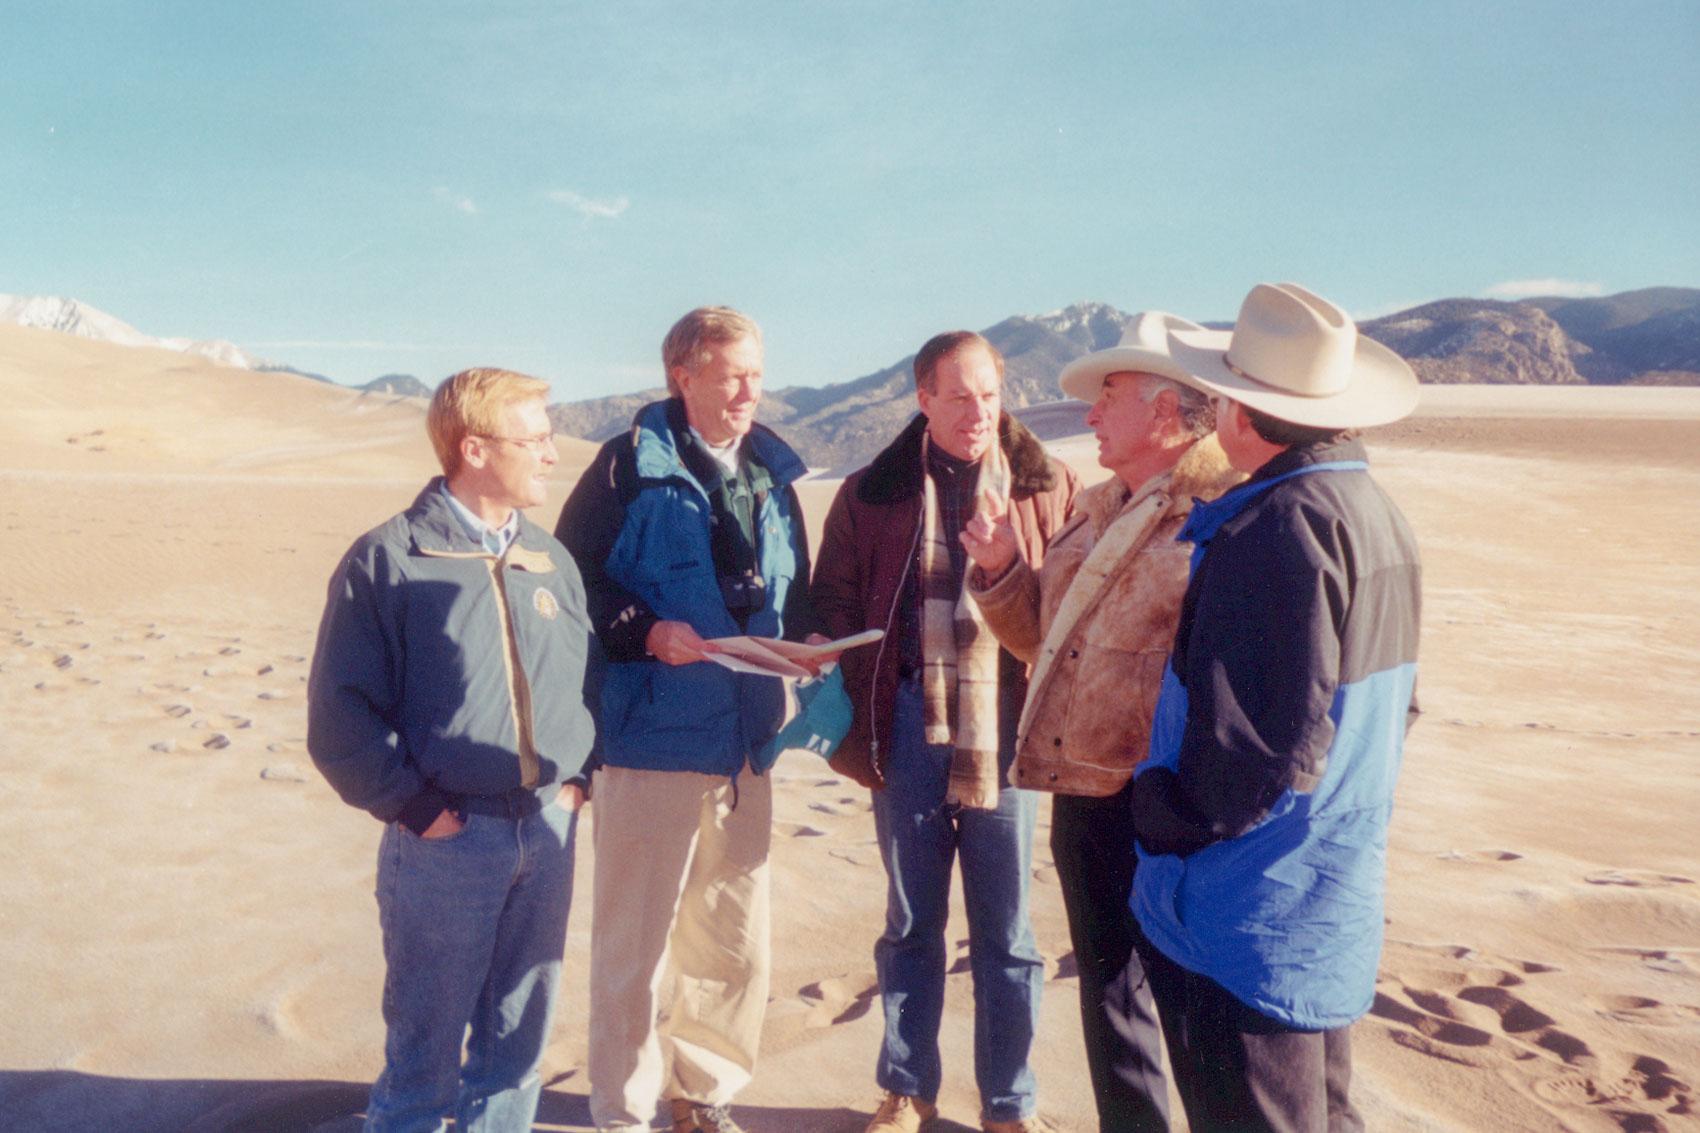 <p>December 18, 1999 marked the Summit in the Sand meeting at Great Sand Dunes National Park. From left to right: Rep Scott McInnis, Interior SecretaryBruce Babbitt, Sen. Wayne Allard, Sen.Ben Nighthorse Campbell andColorado Attorney General Ken Salazar.</p>